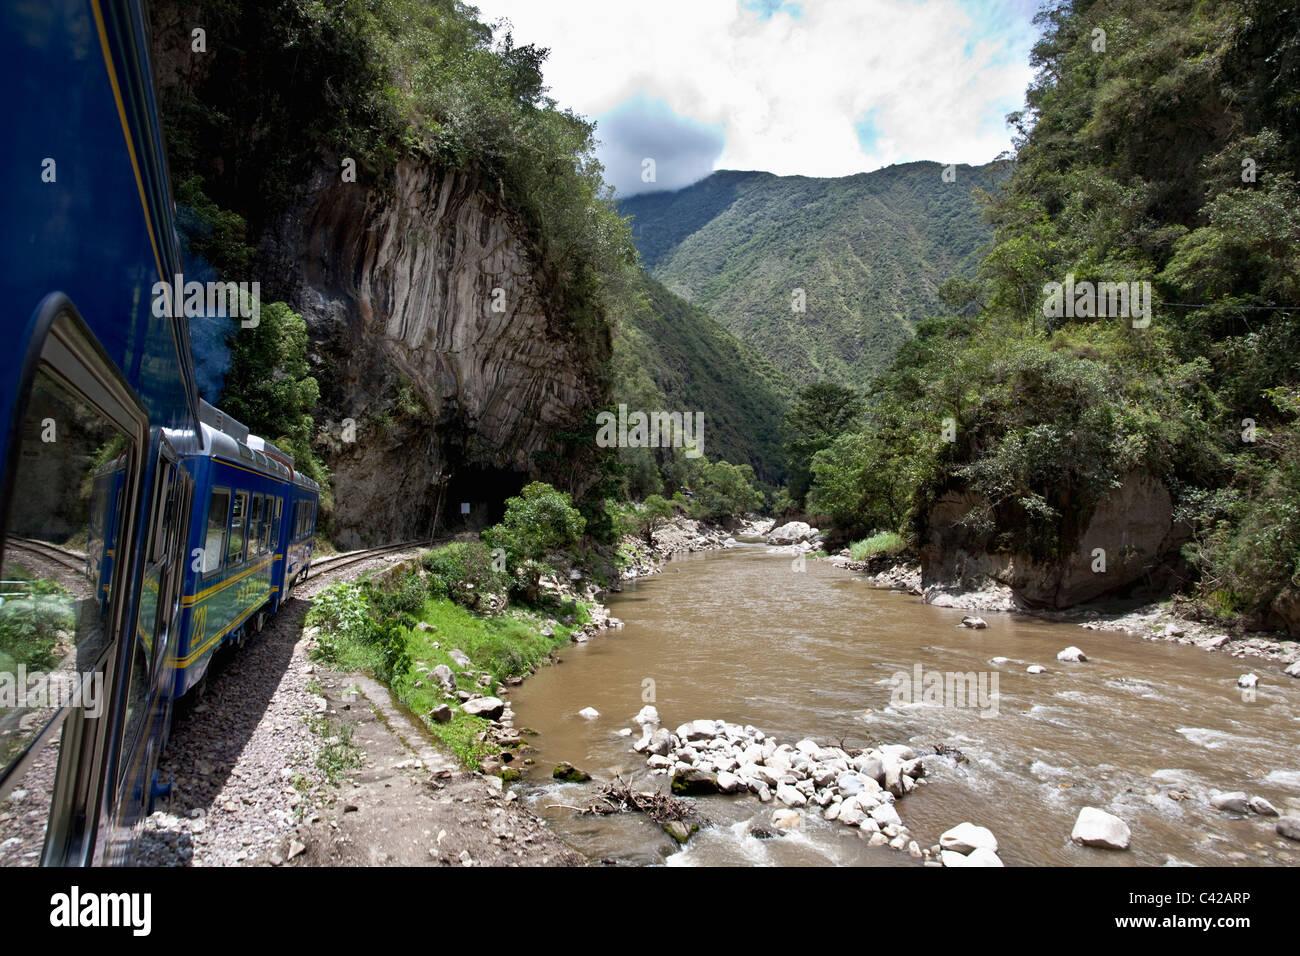 Peru, Aguas Calientes, Machu Picchu, Train from Ollantaytambo to Aguas Calientes. Stock Photo